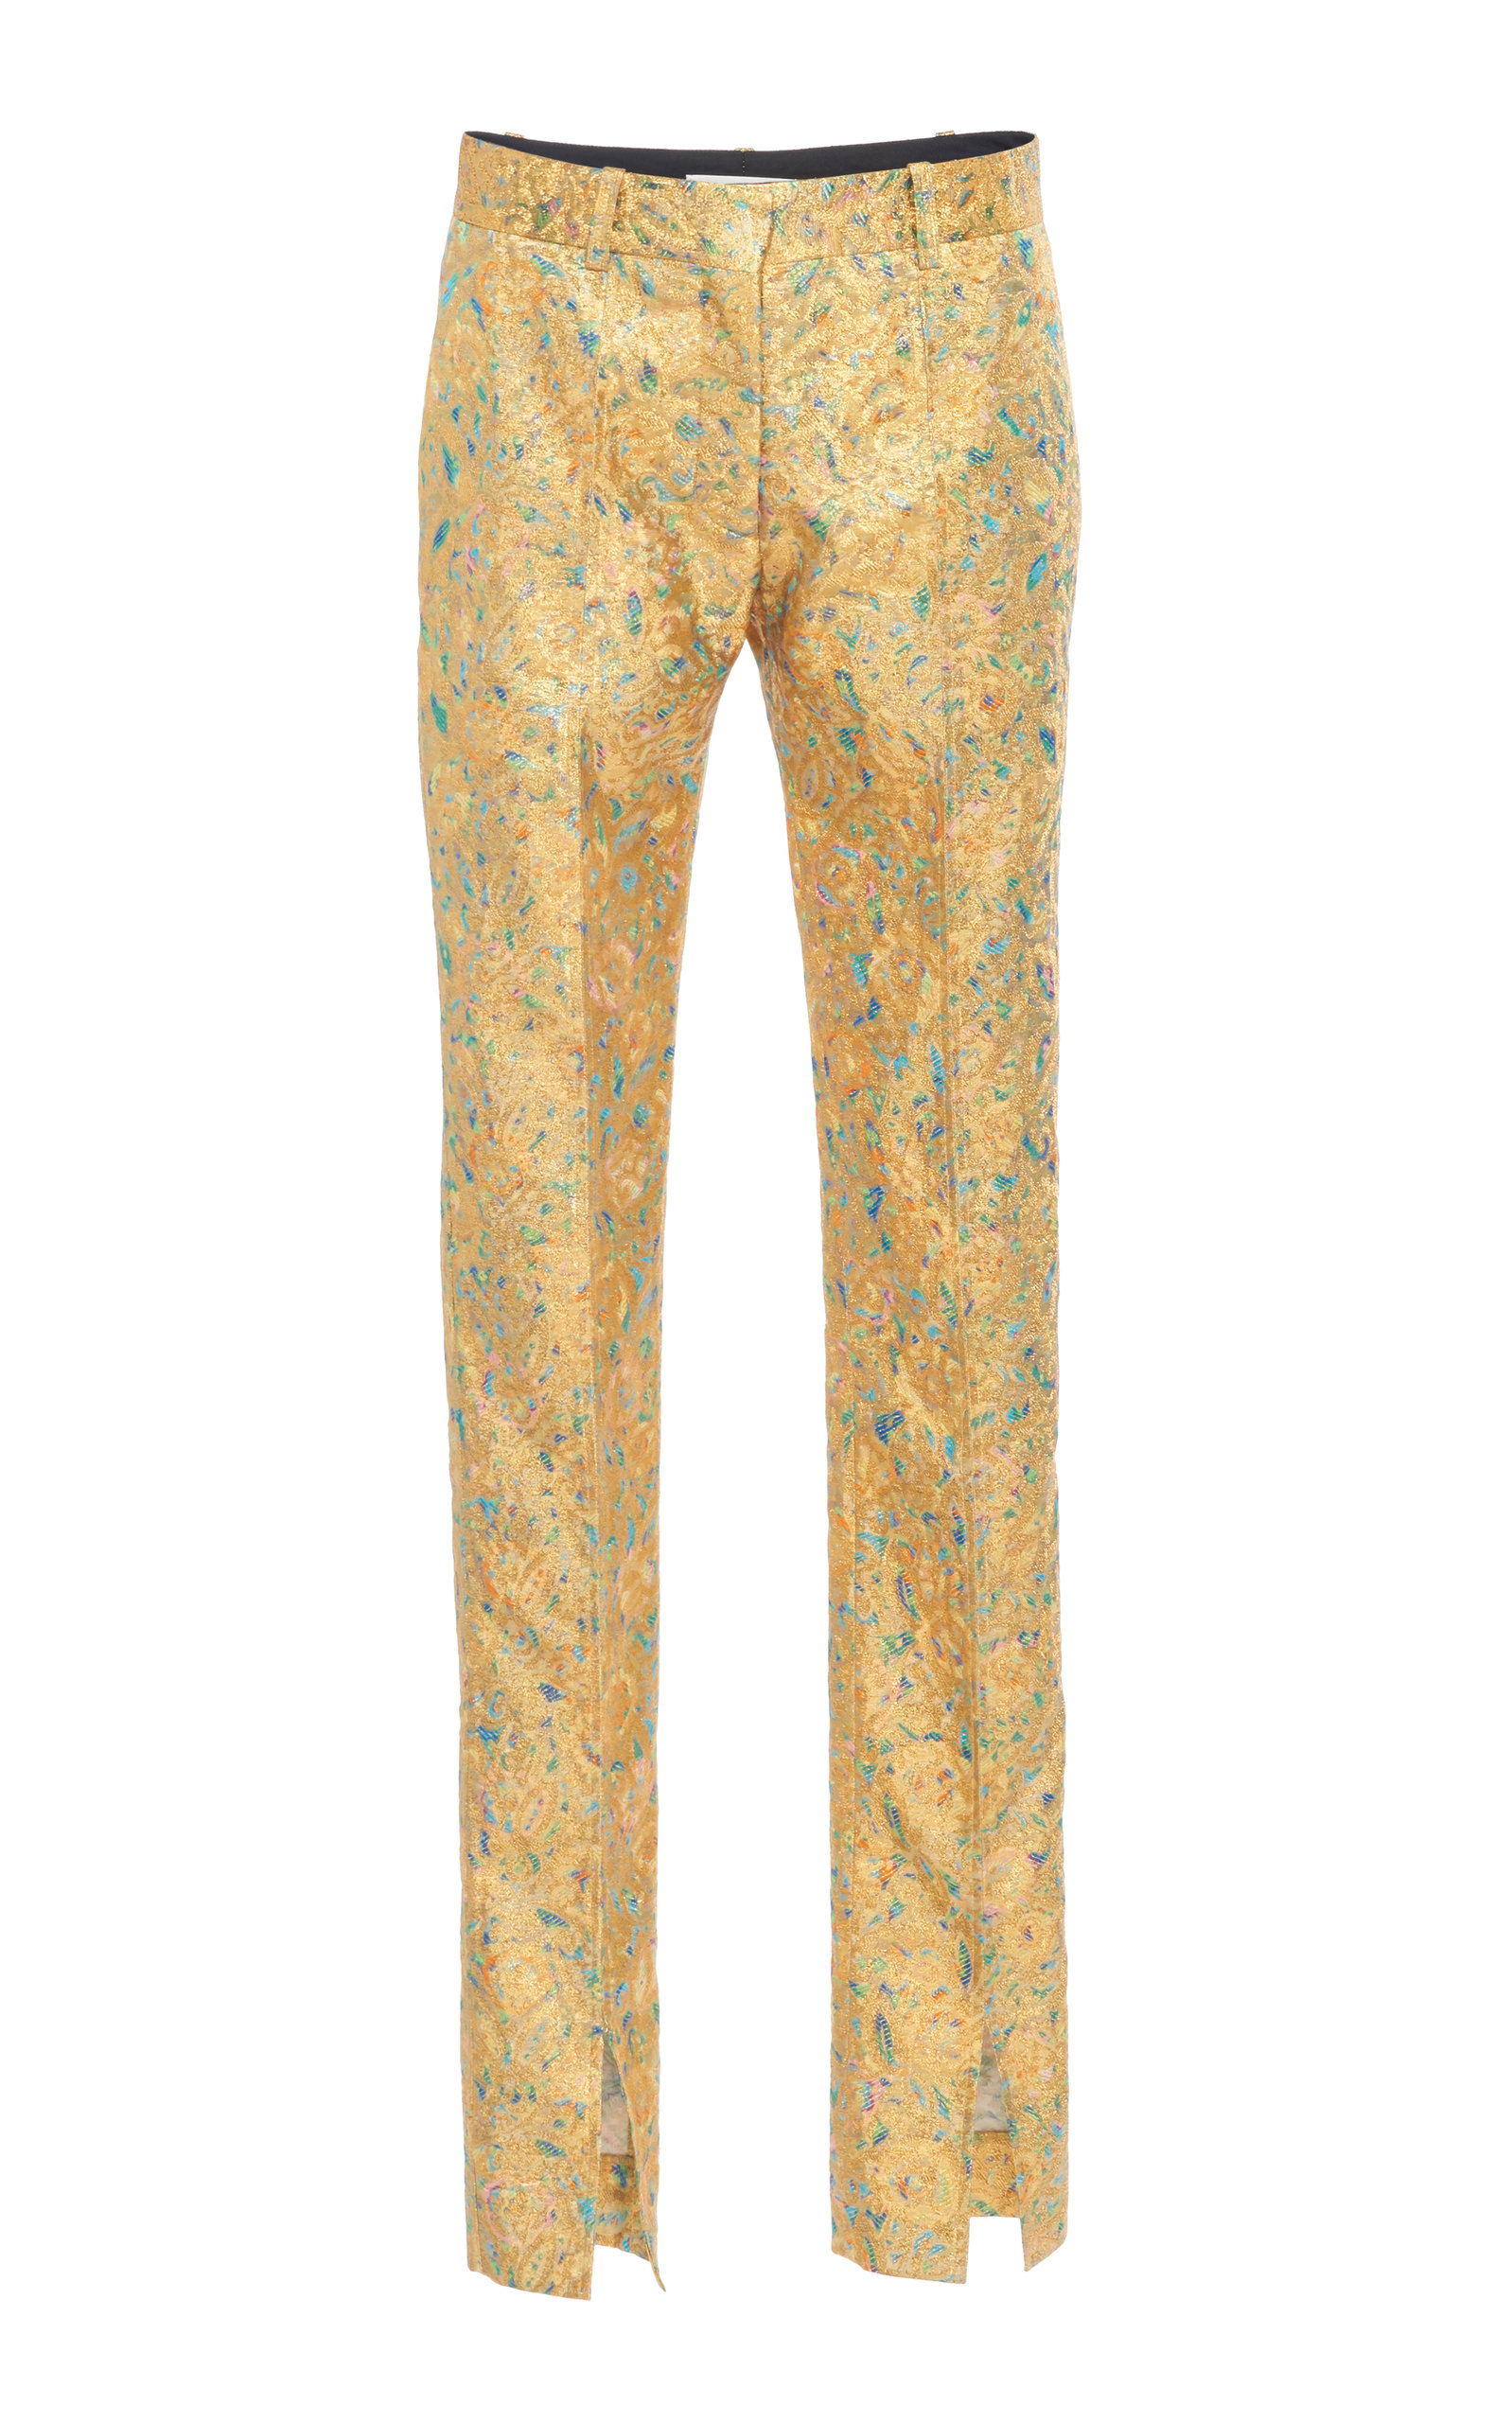 Victoria Beckham SKINNY METALLIC JACQUARD PANTS